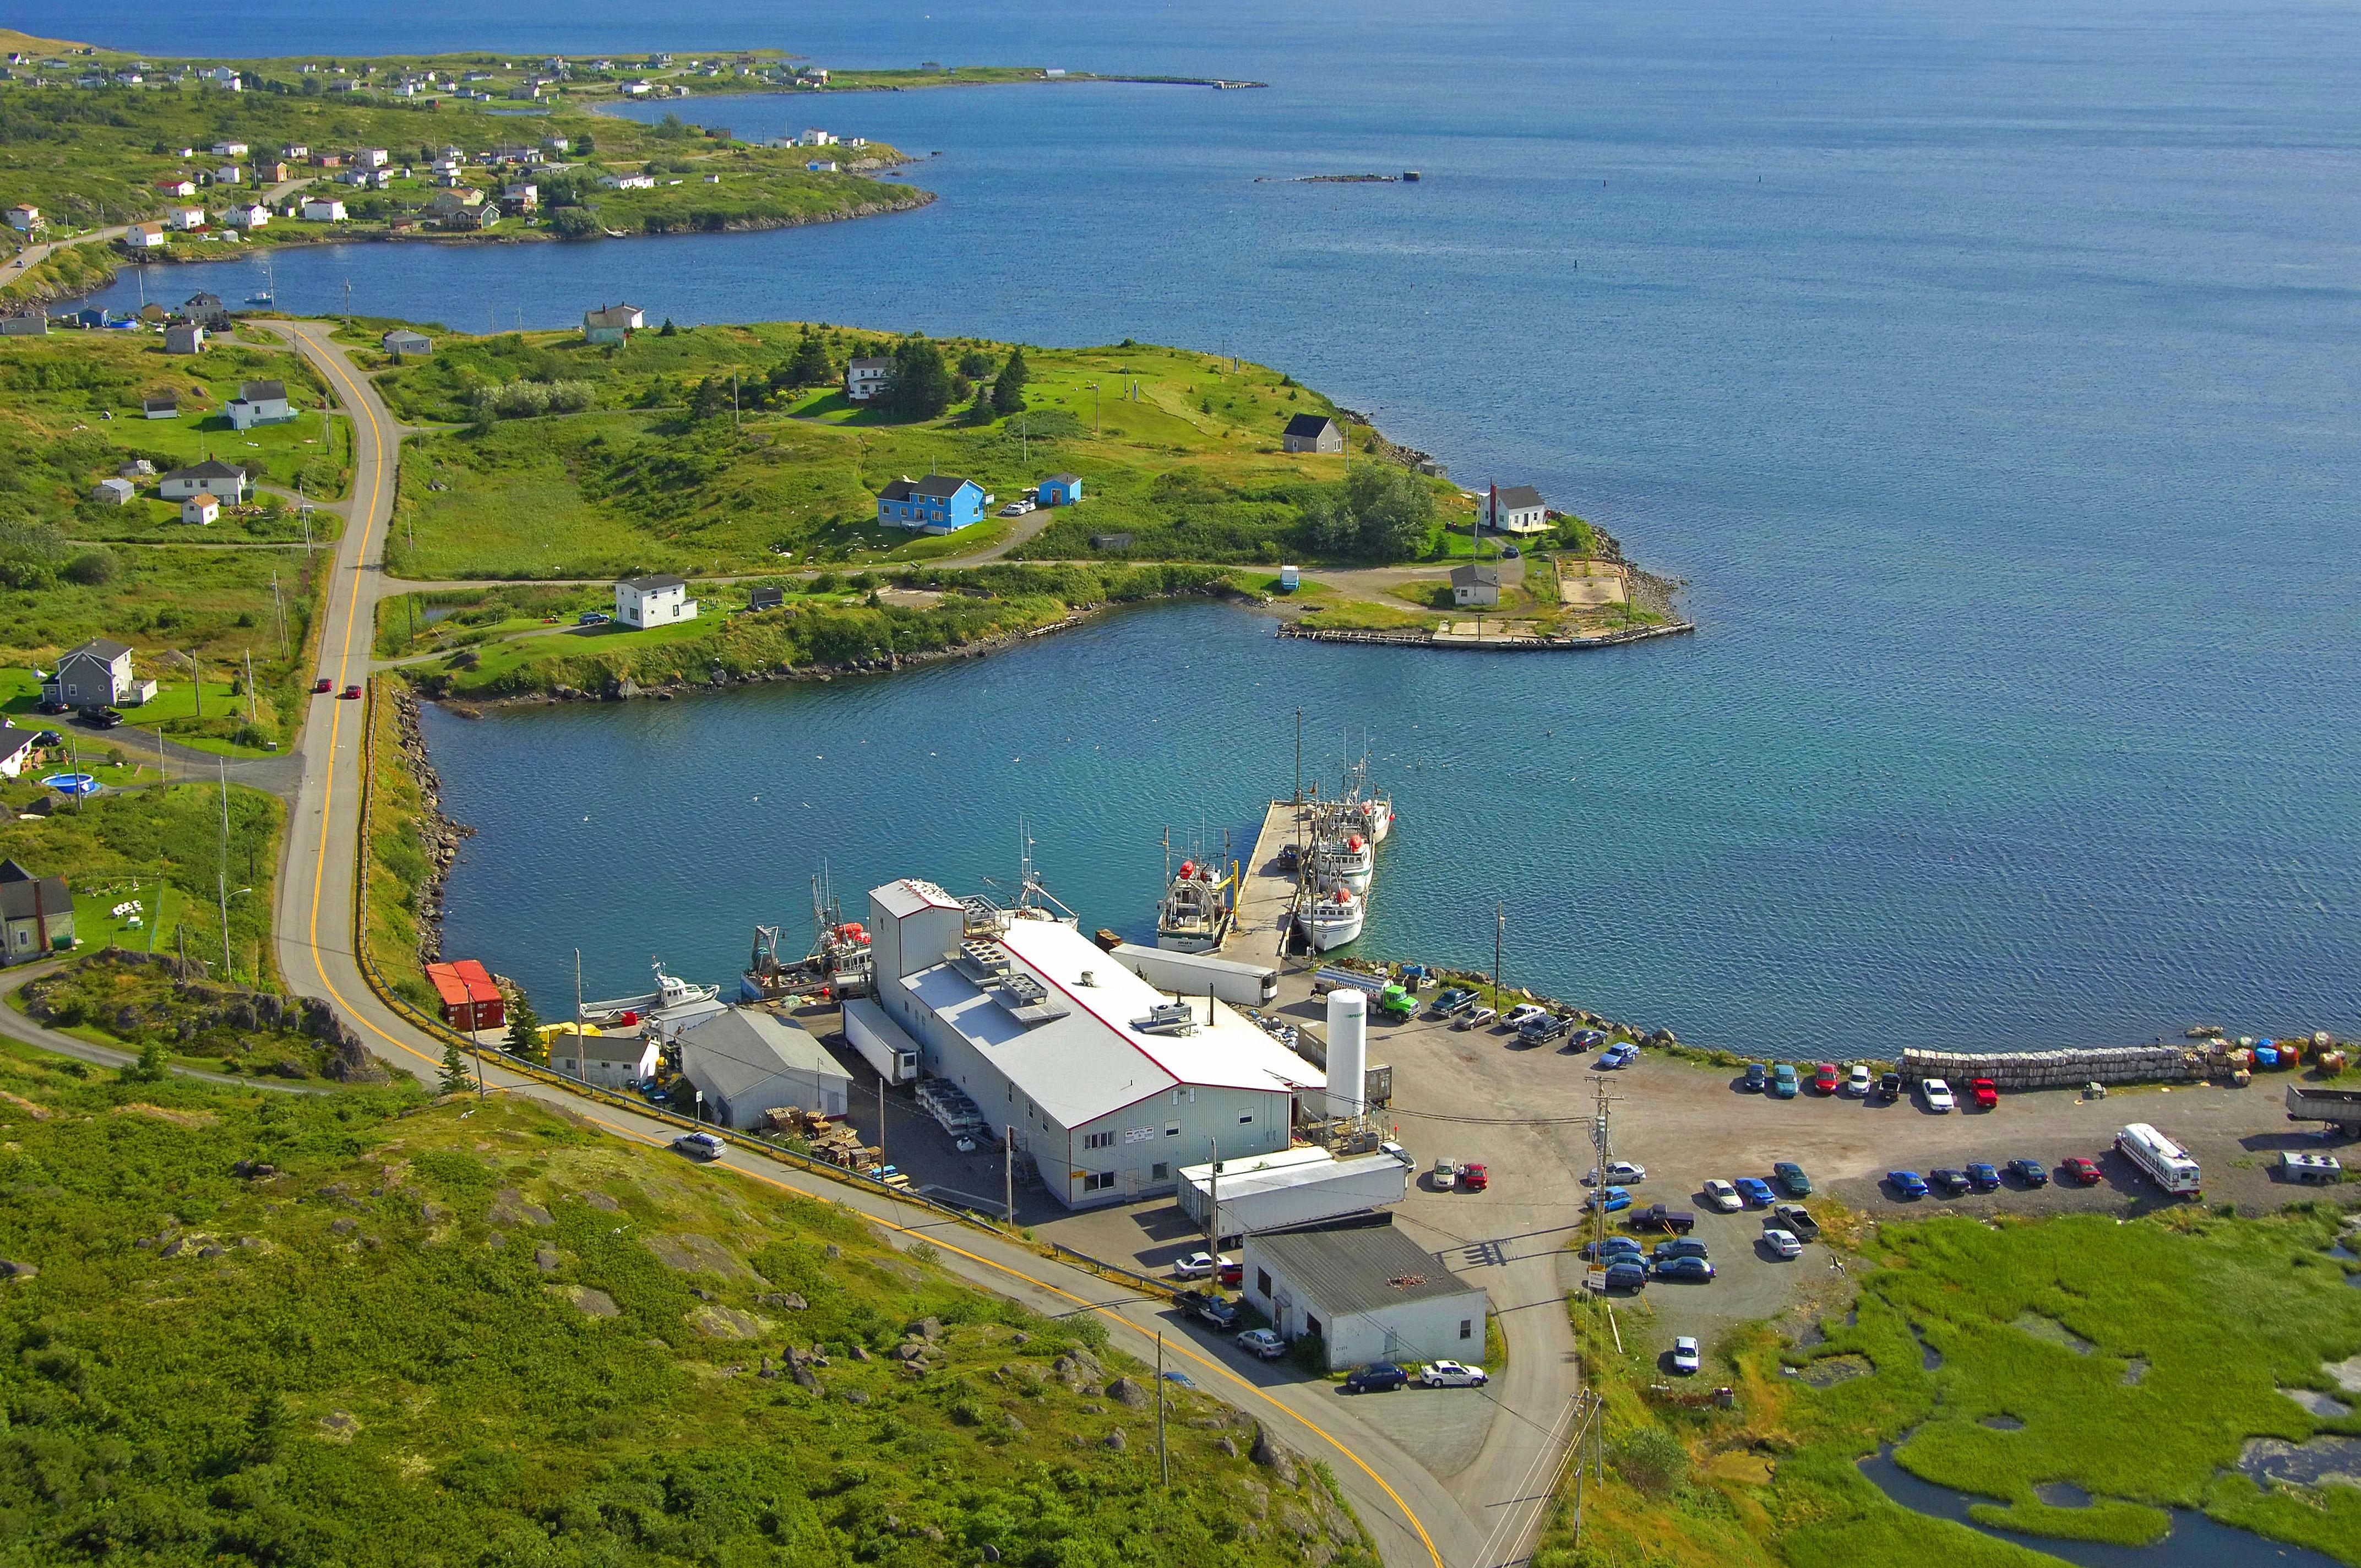 Petit de Grat Packers Wharf in Petit de Grat, NS, Canada - Marina